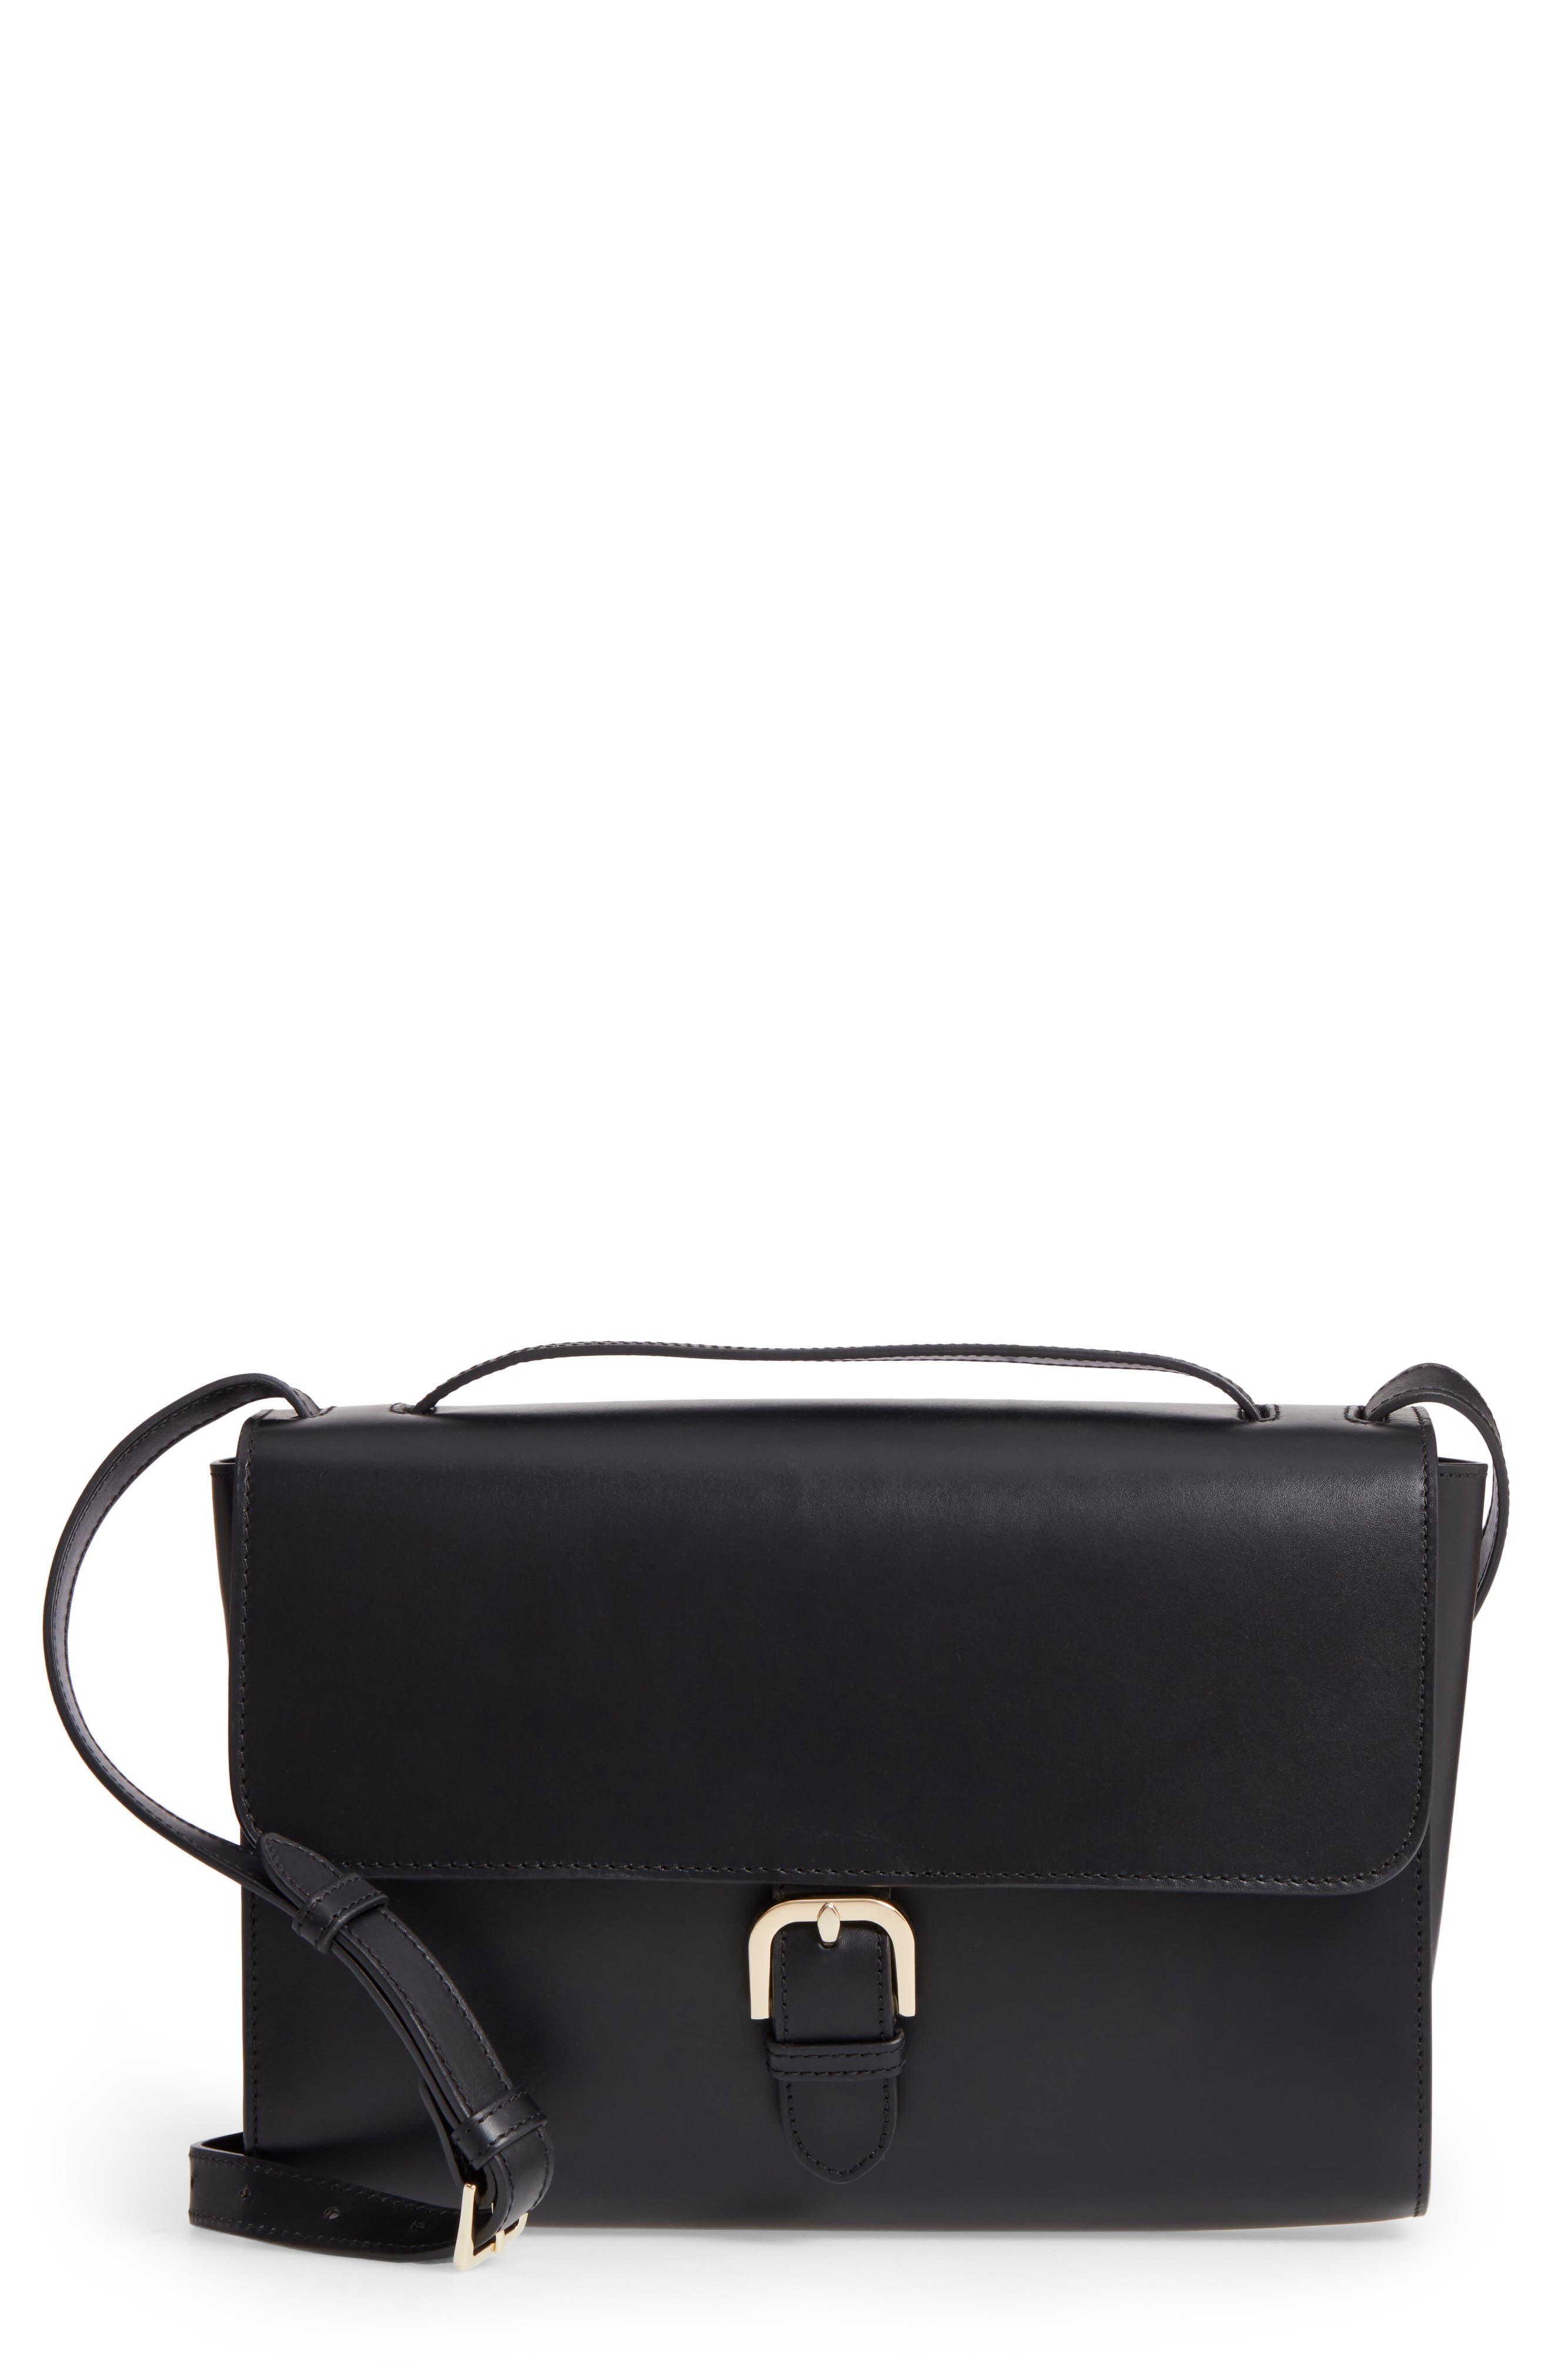 Main Image - A.P.C. Katy Calfskin Leather Messenger Bag